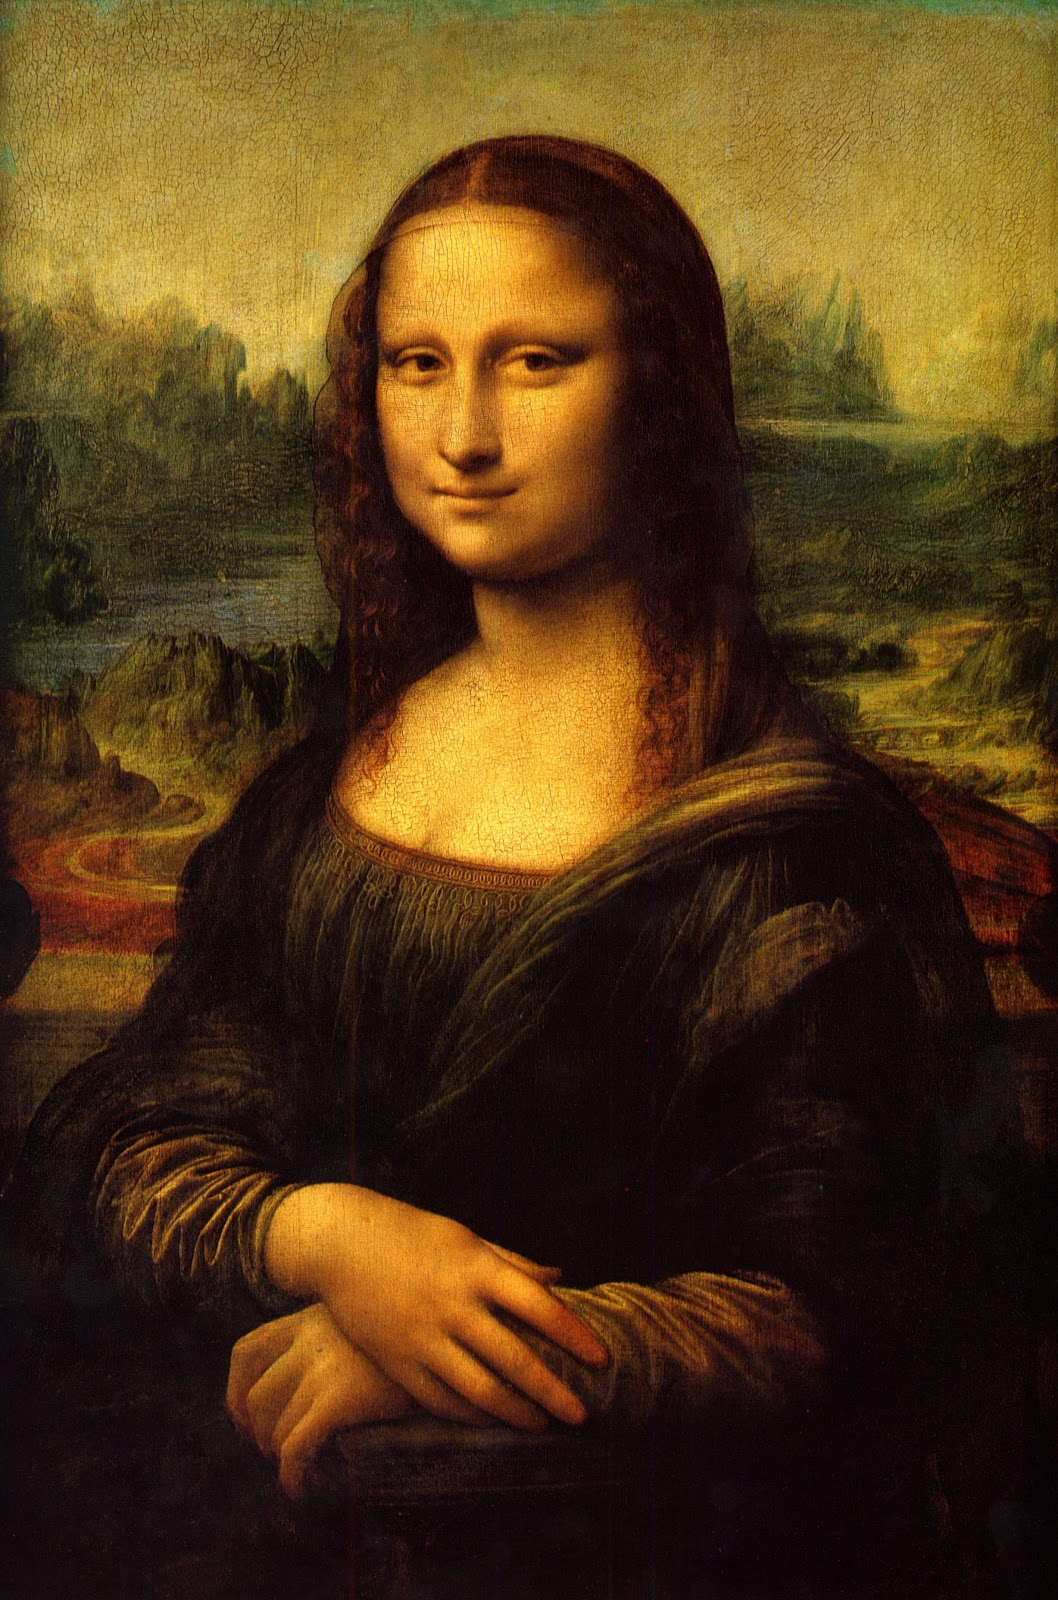 http://3.bp.blogspot.com/-SutQucrupwk/UJwLHJtO8xI/AAAAAAAAAFs/g4wHRy2d7O4/s1600/Mona_Lisa.jpg